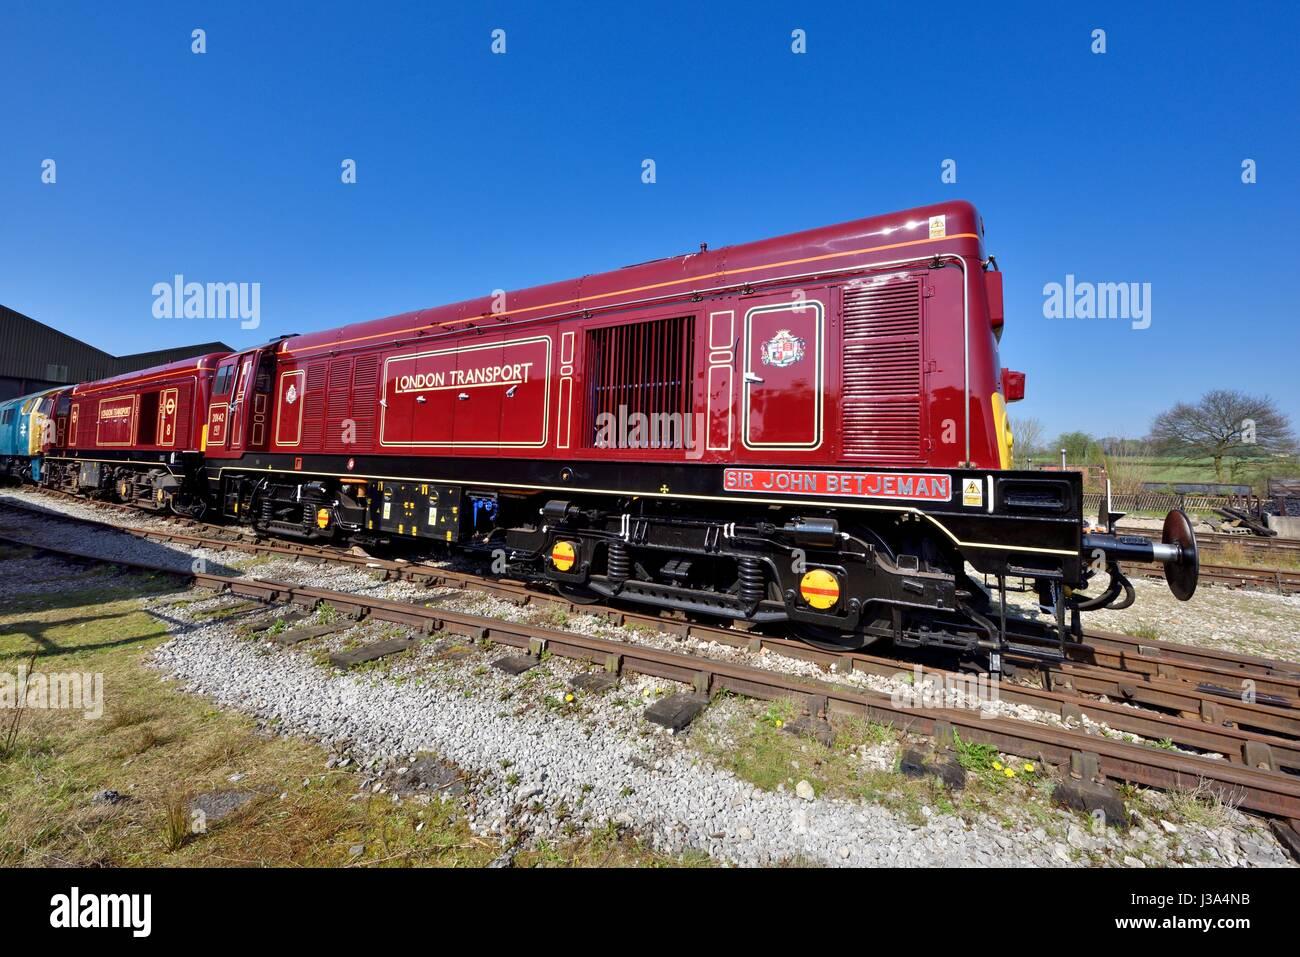 Class 20 Diesel locomotive in London Transport livery ...